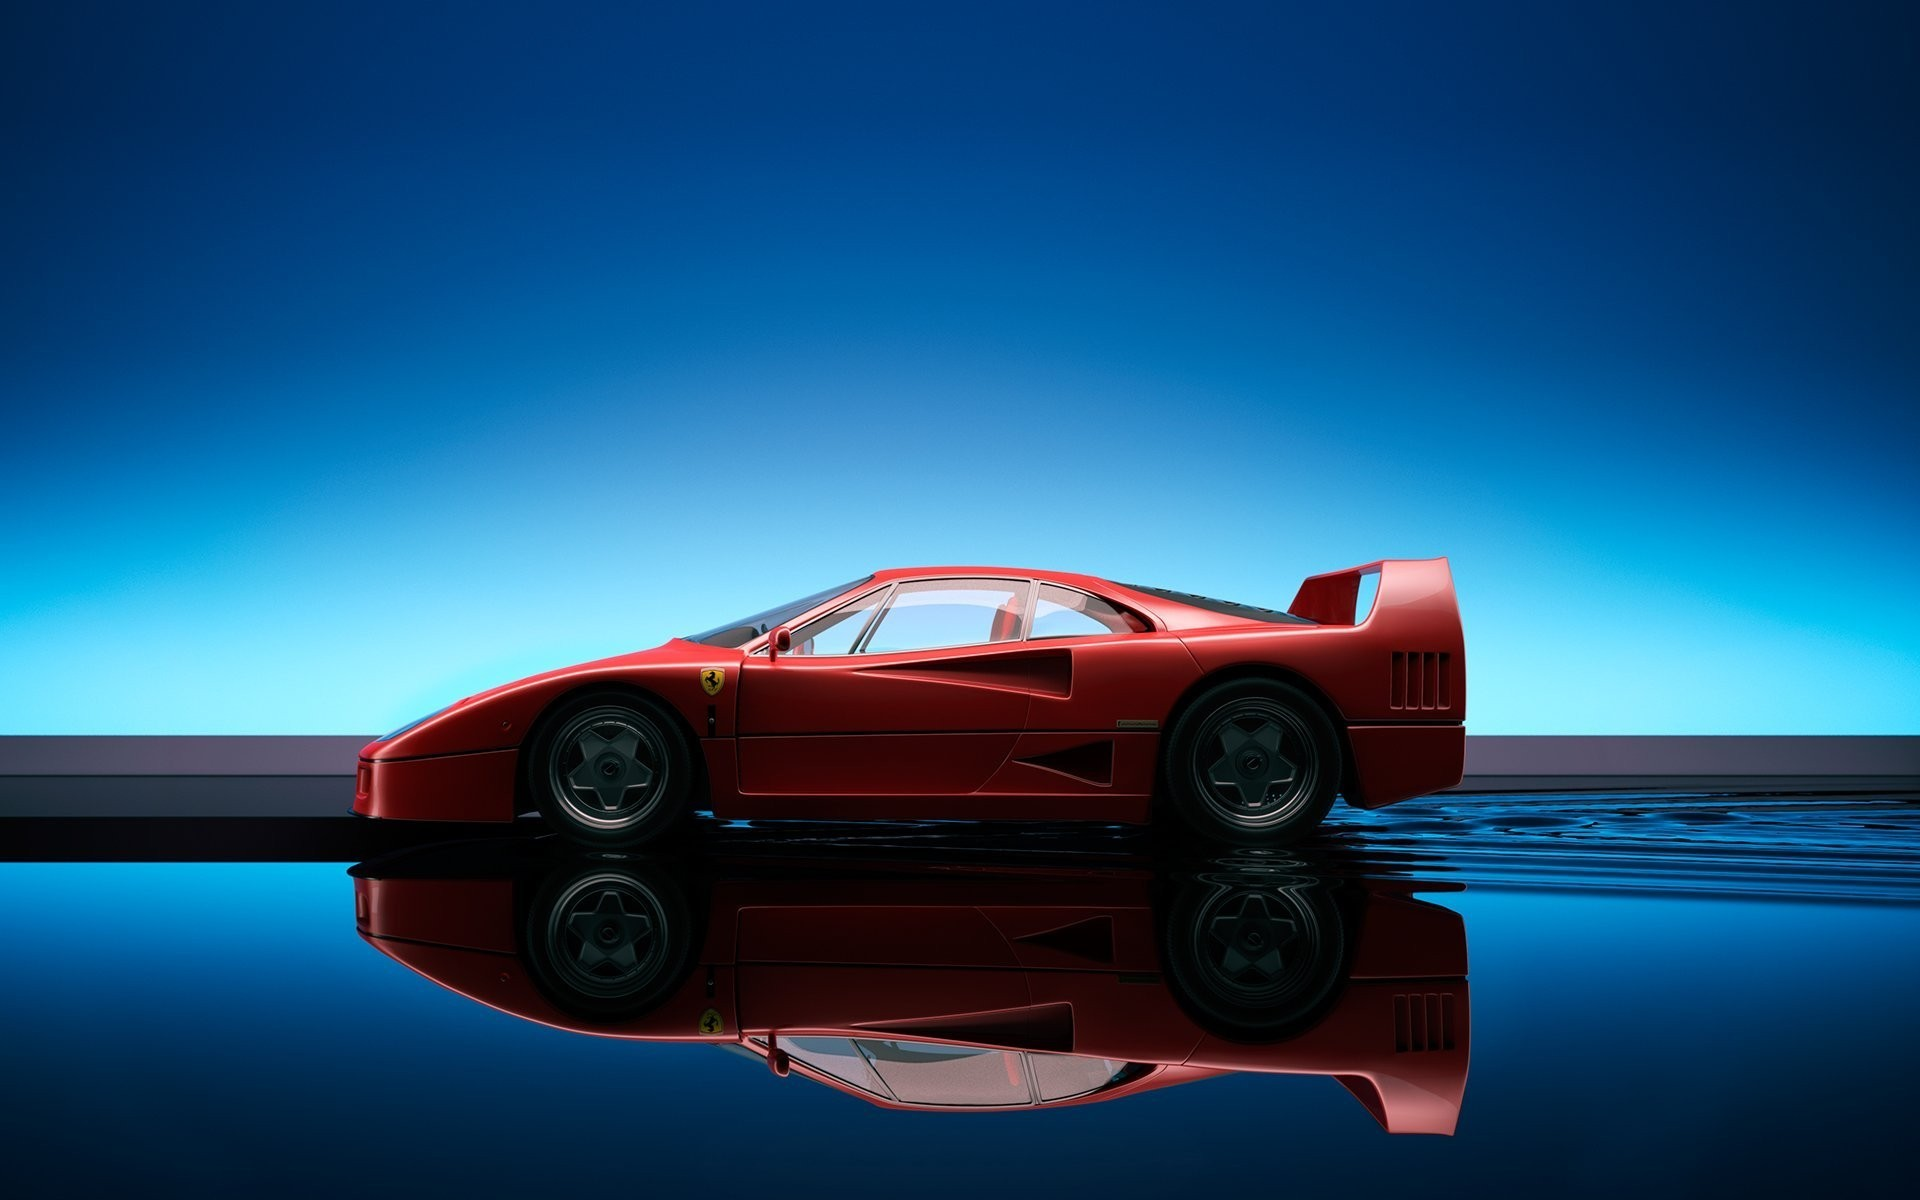 Adorable HDQ Backgrounds of Ferrari F40, 1920×1200